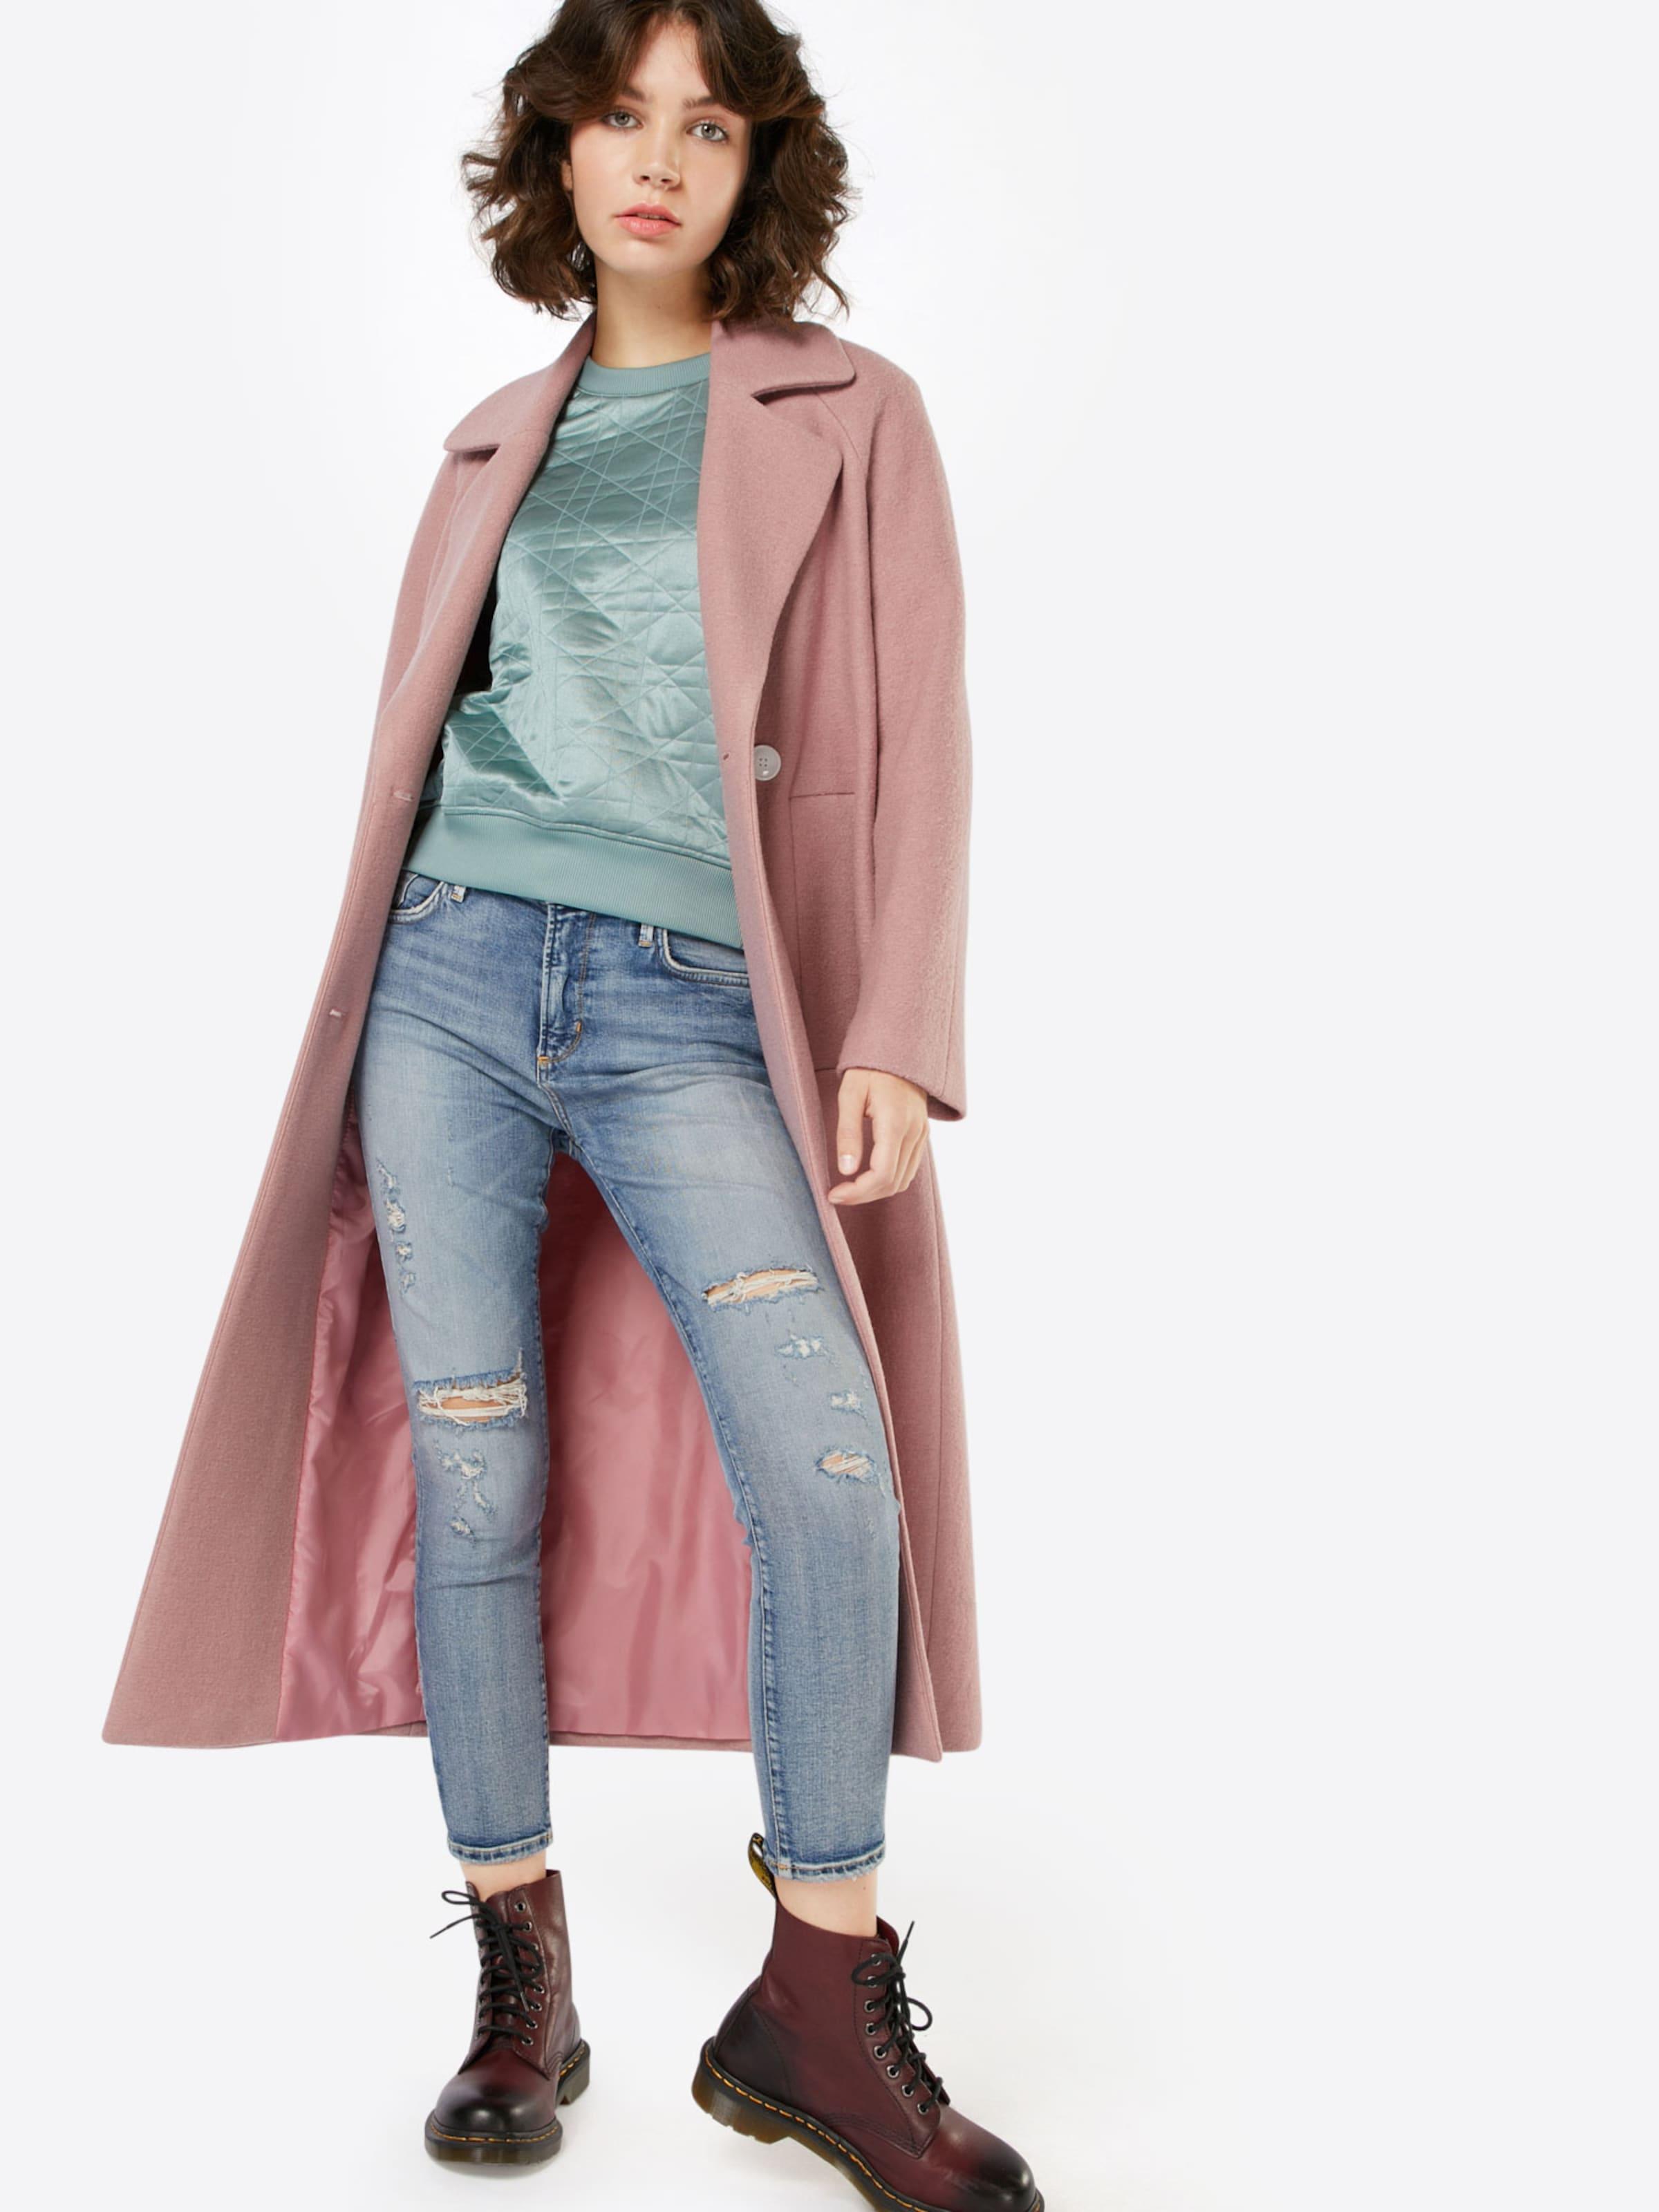 G-STAR RAW Sweater 'Dalcie' Niedriger Versand Zum Verkauf 4J2bp